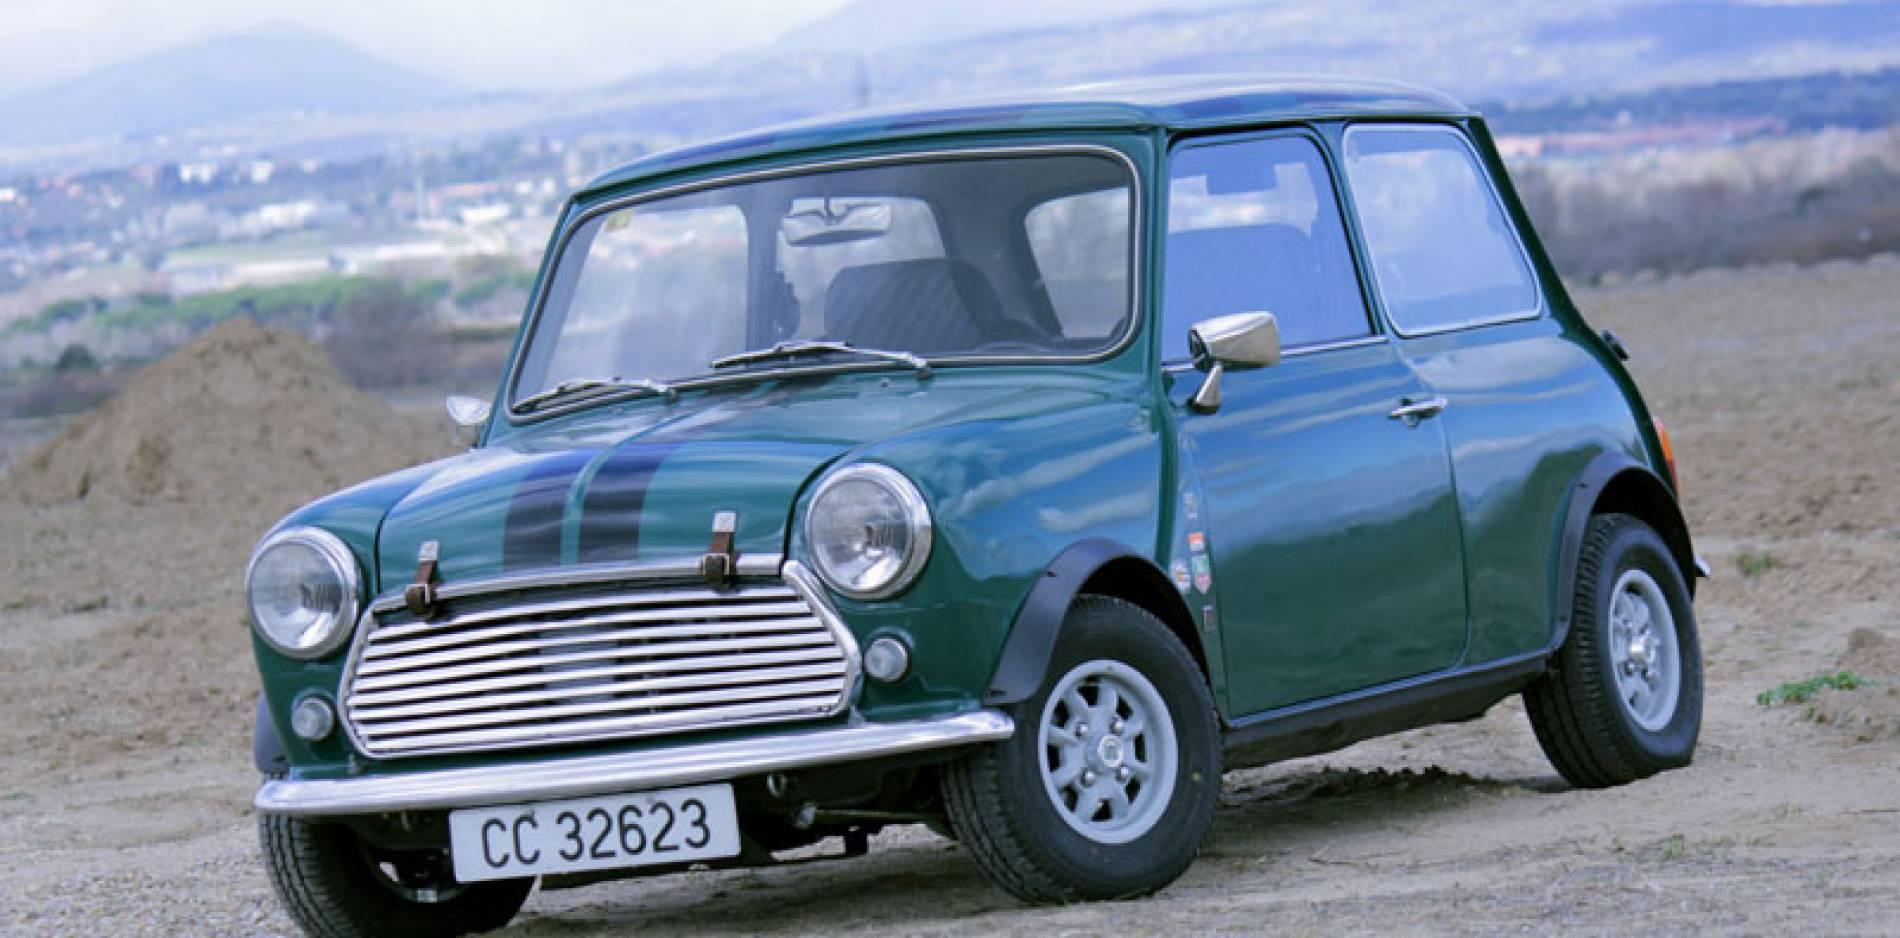 Prueba del Authi Mini Cooper 1300: el deseado